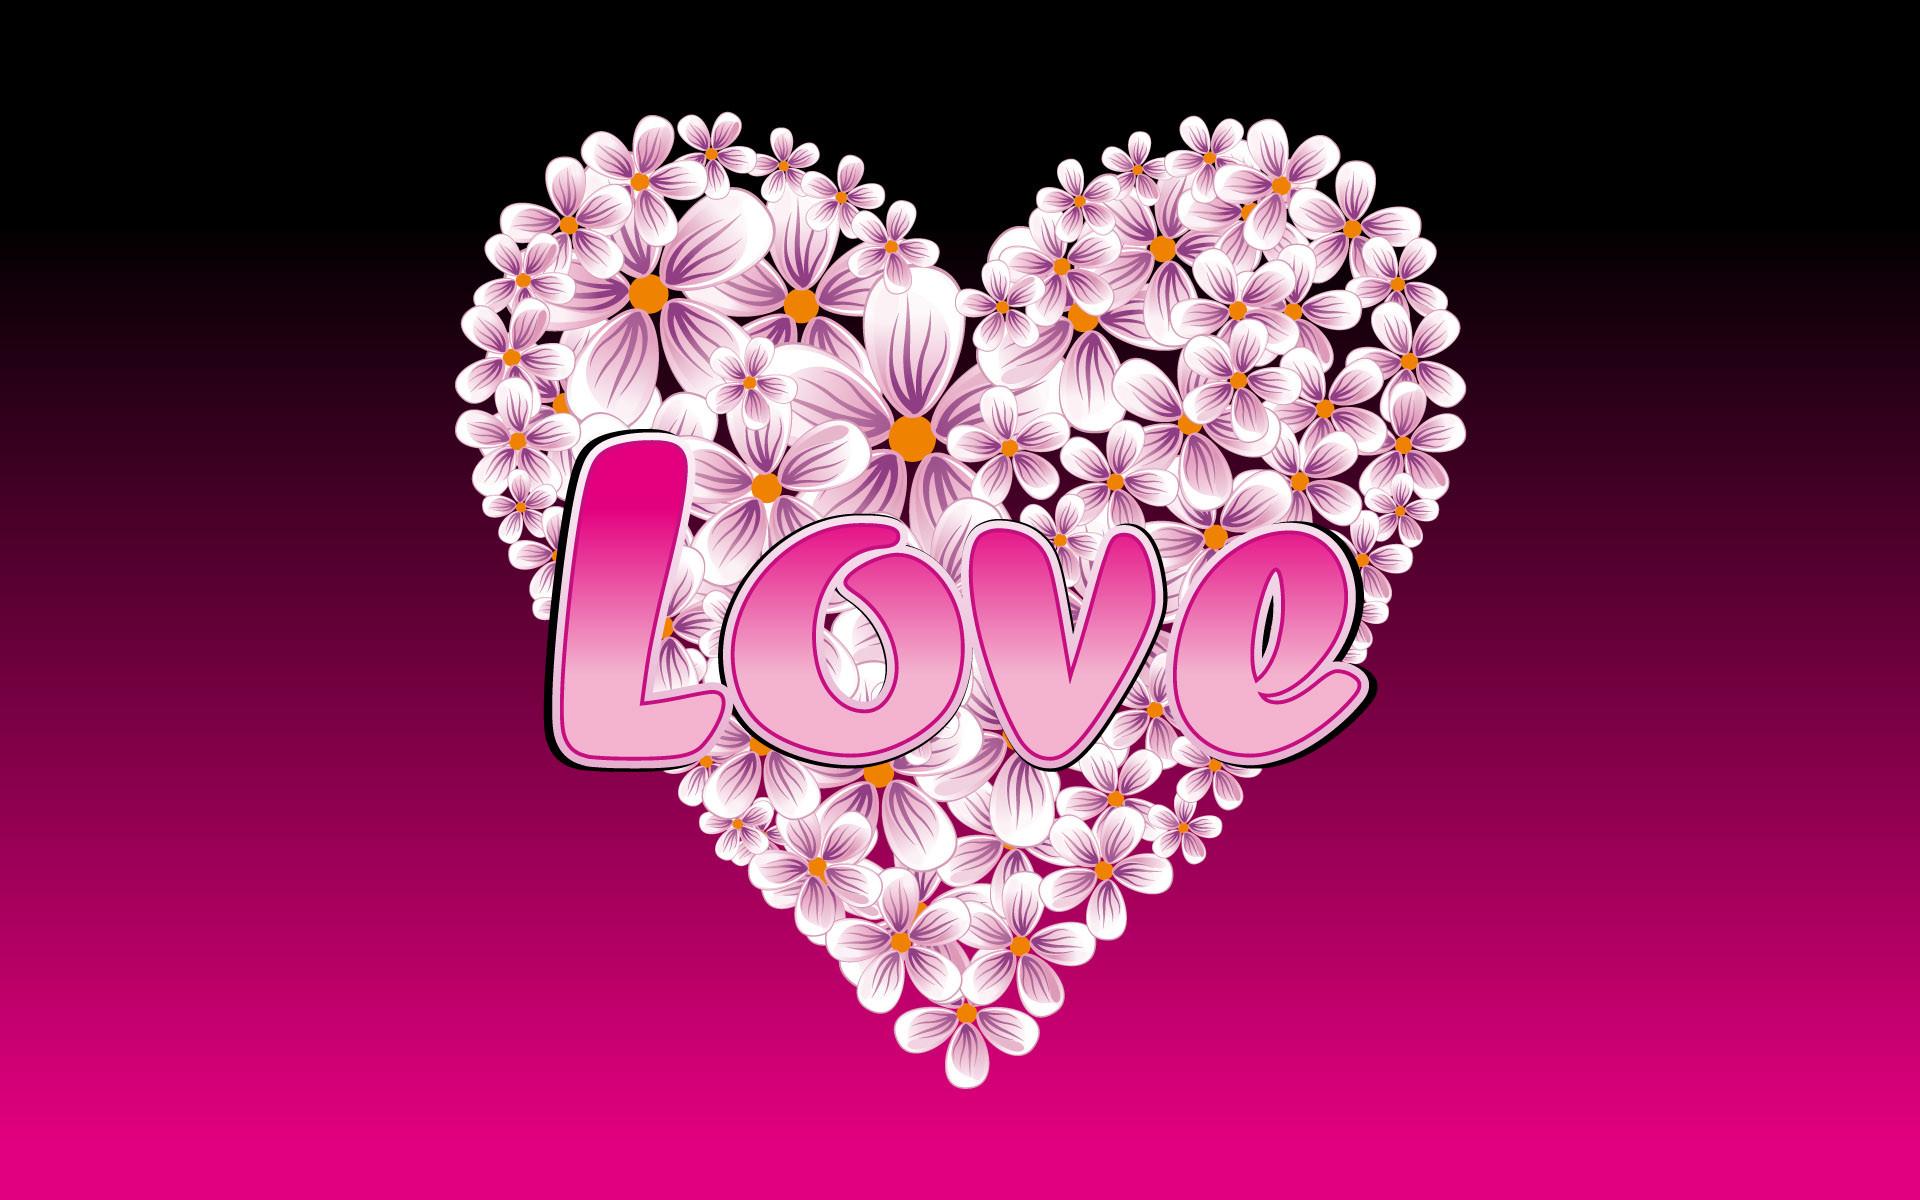 beautibul hearts | … , wallpaper, floral, valentine, wallpapers, heart